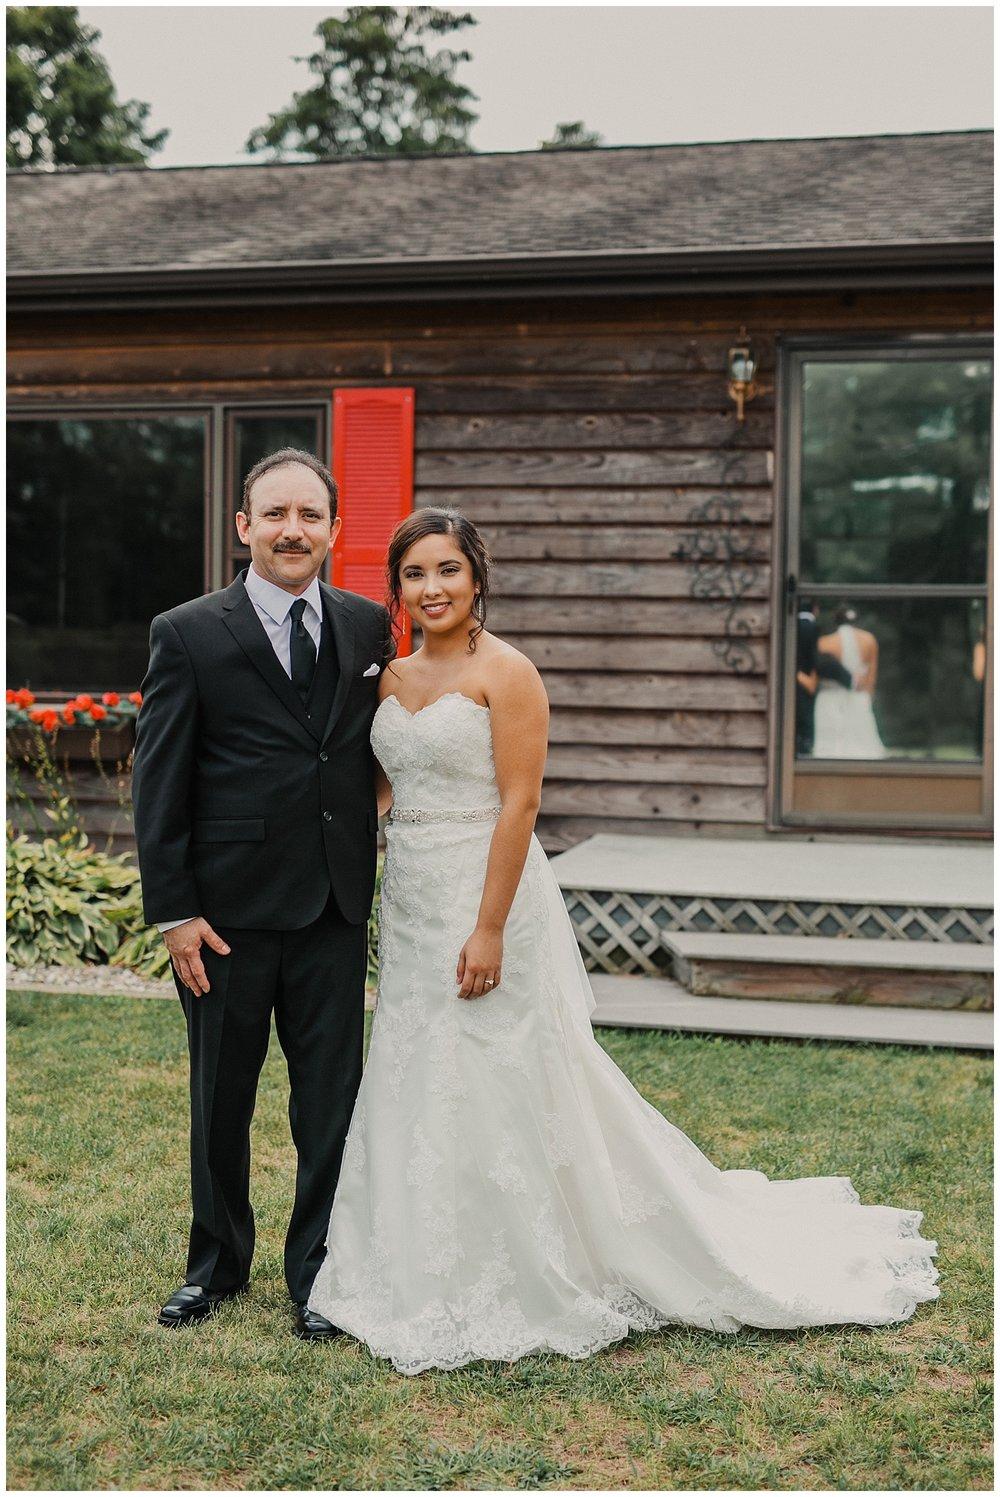 lindybeth photography - huisinga wedding - gable hill - blog-40.jpg